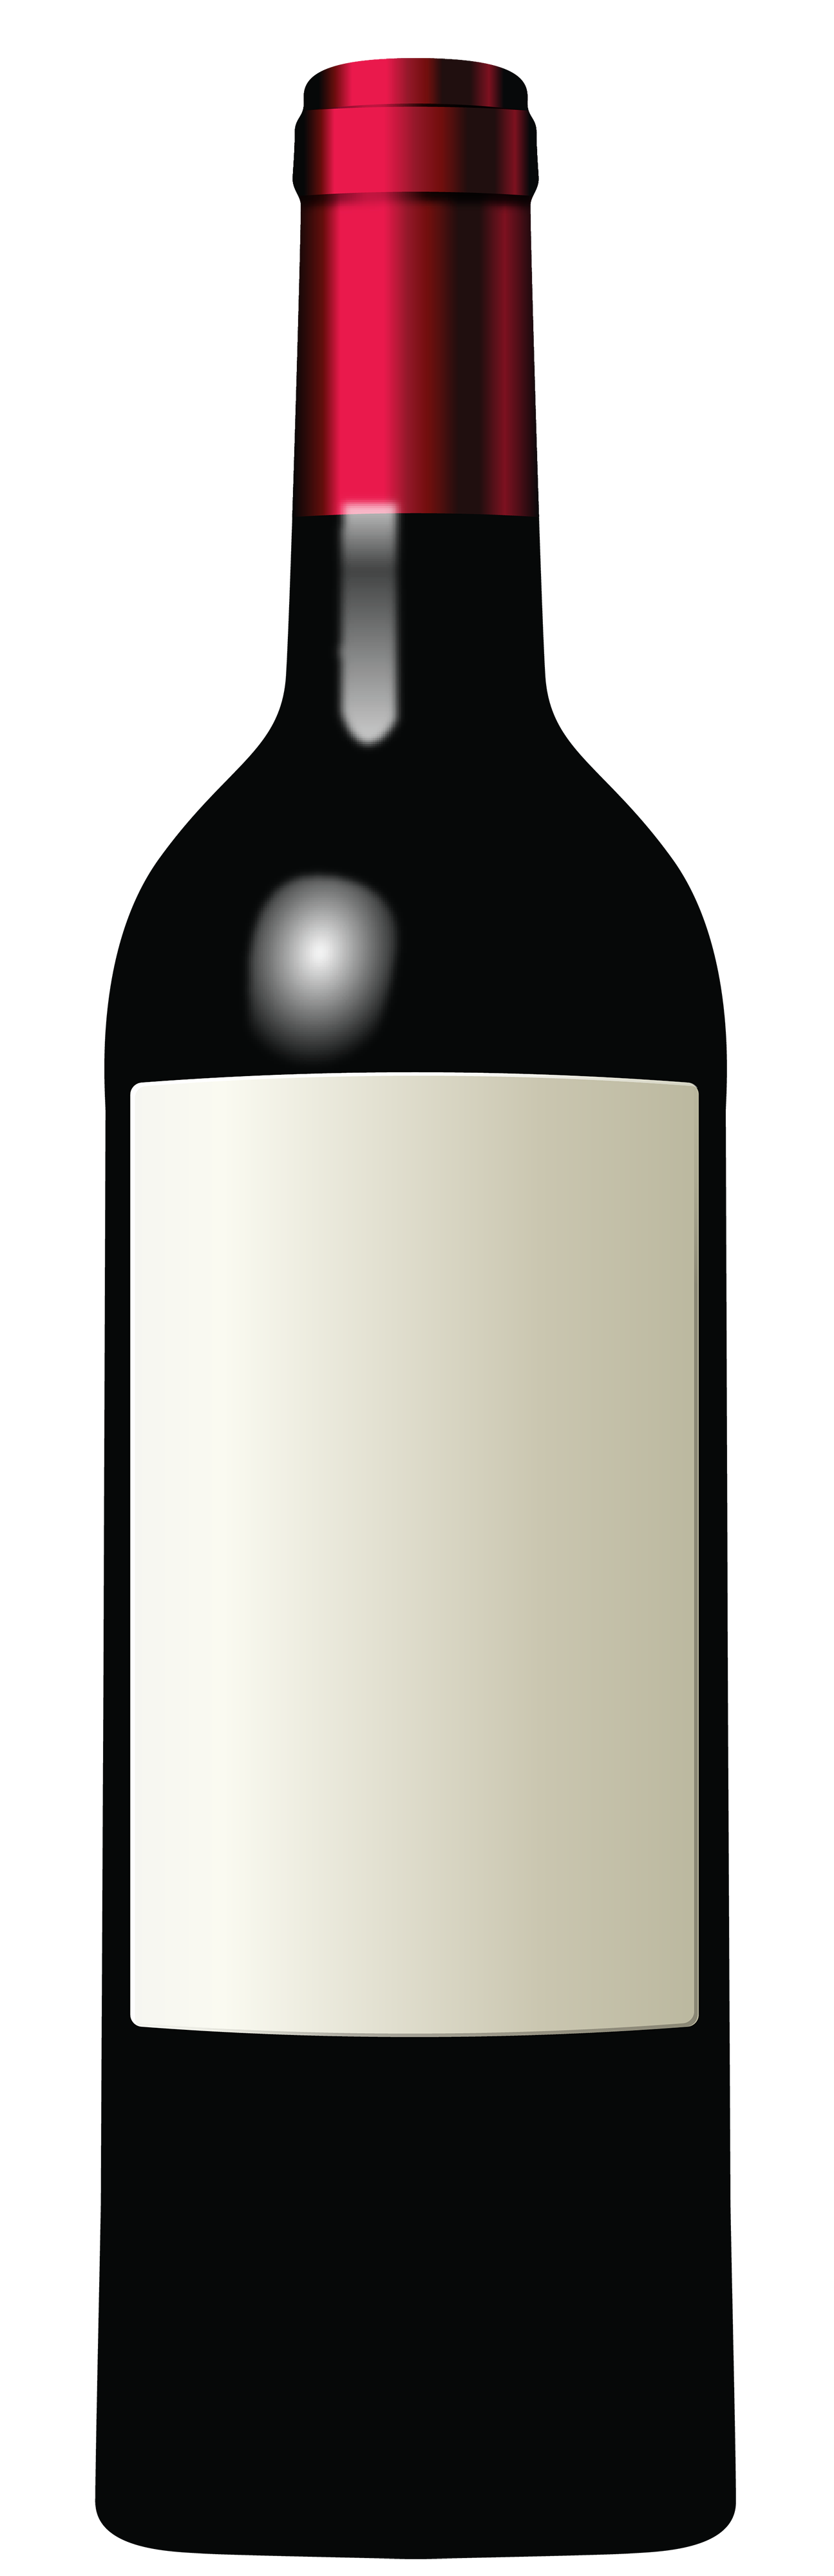 Wine bottle clipart the .-Wine bottle clipart the .-4